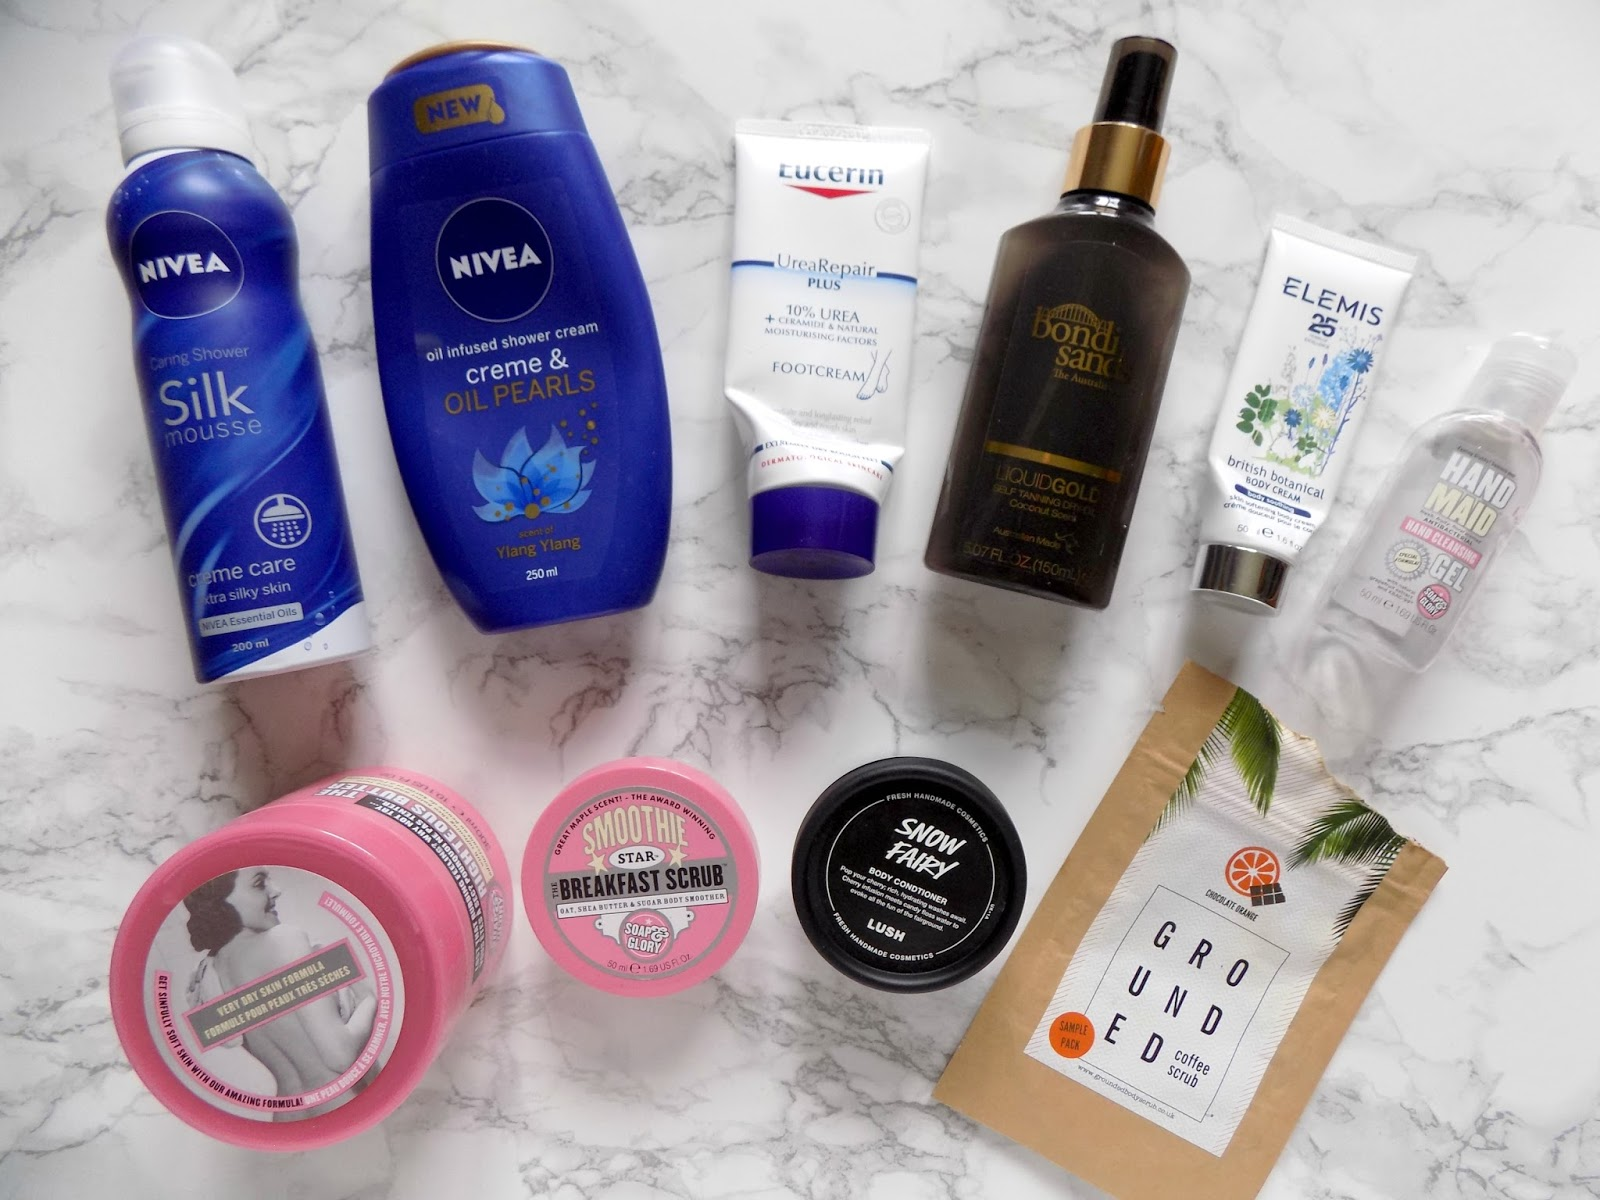 bodycare empties nivea soap and glory bondi sands